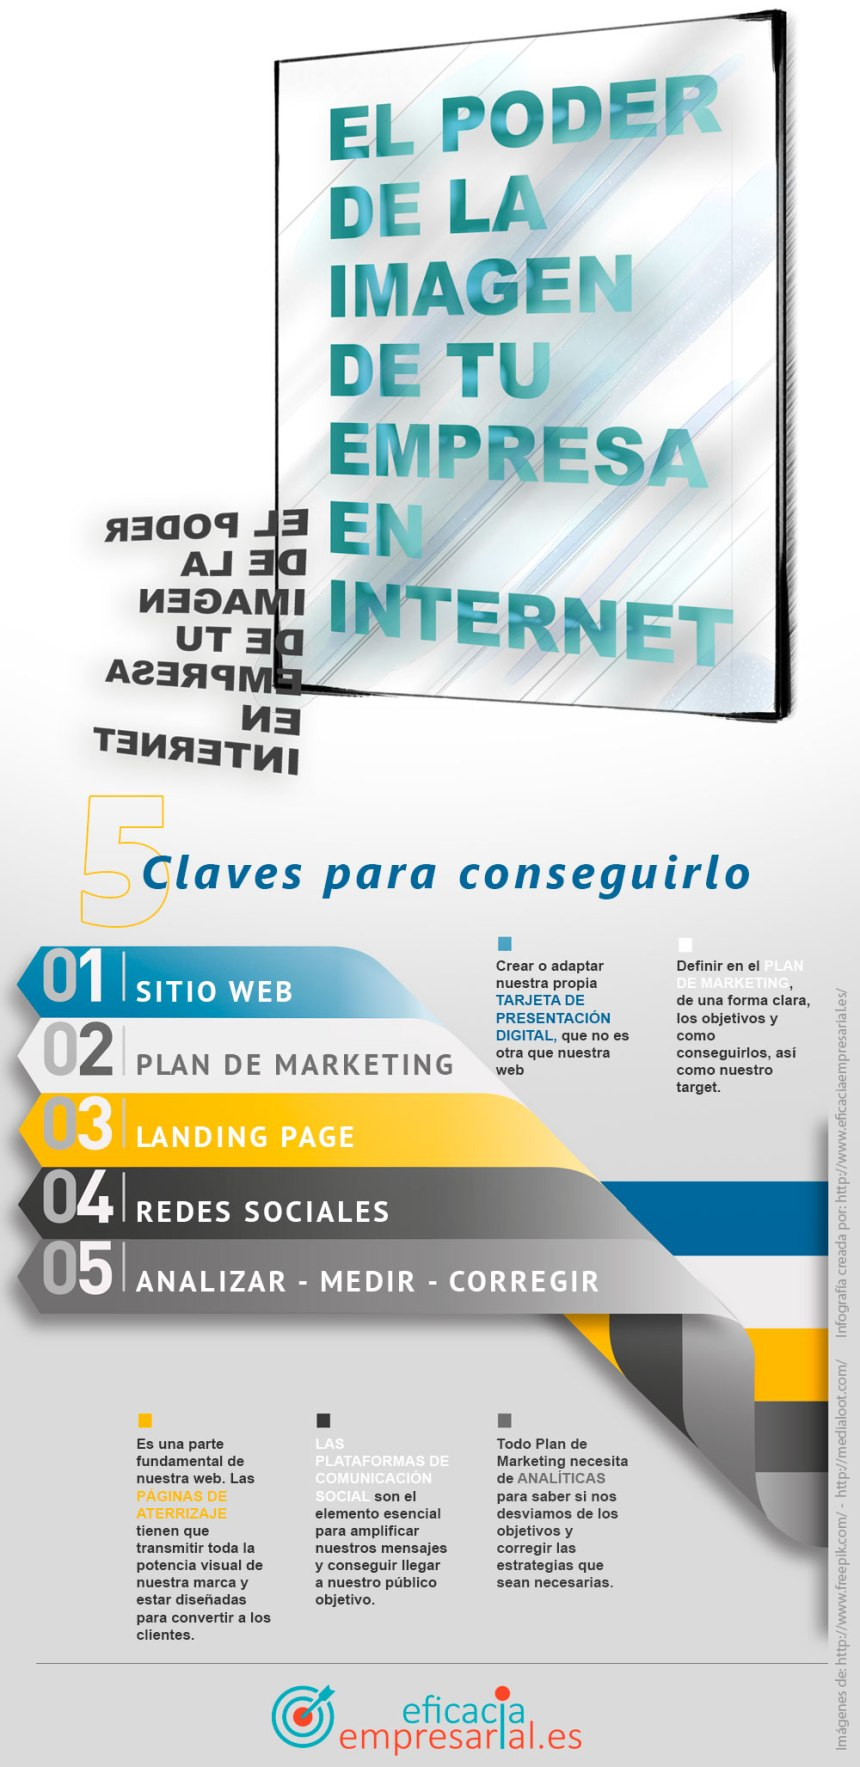 El poder de la imagen de tu empresa en Internet